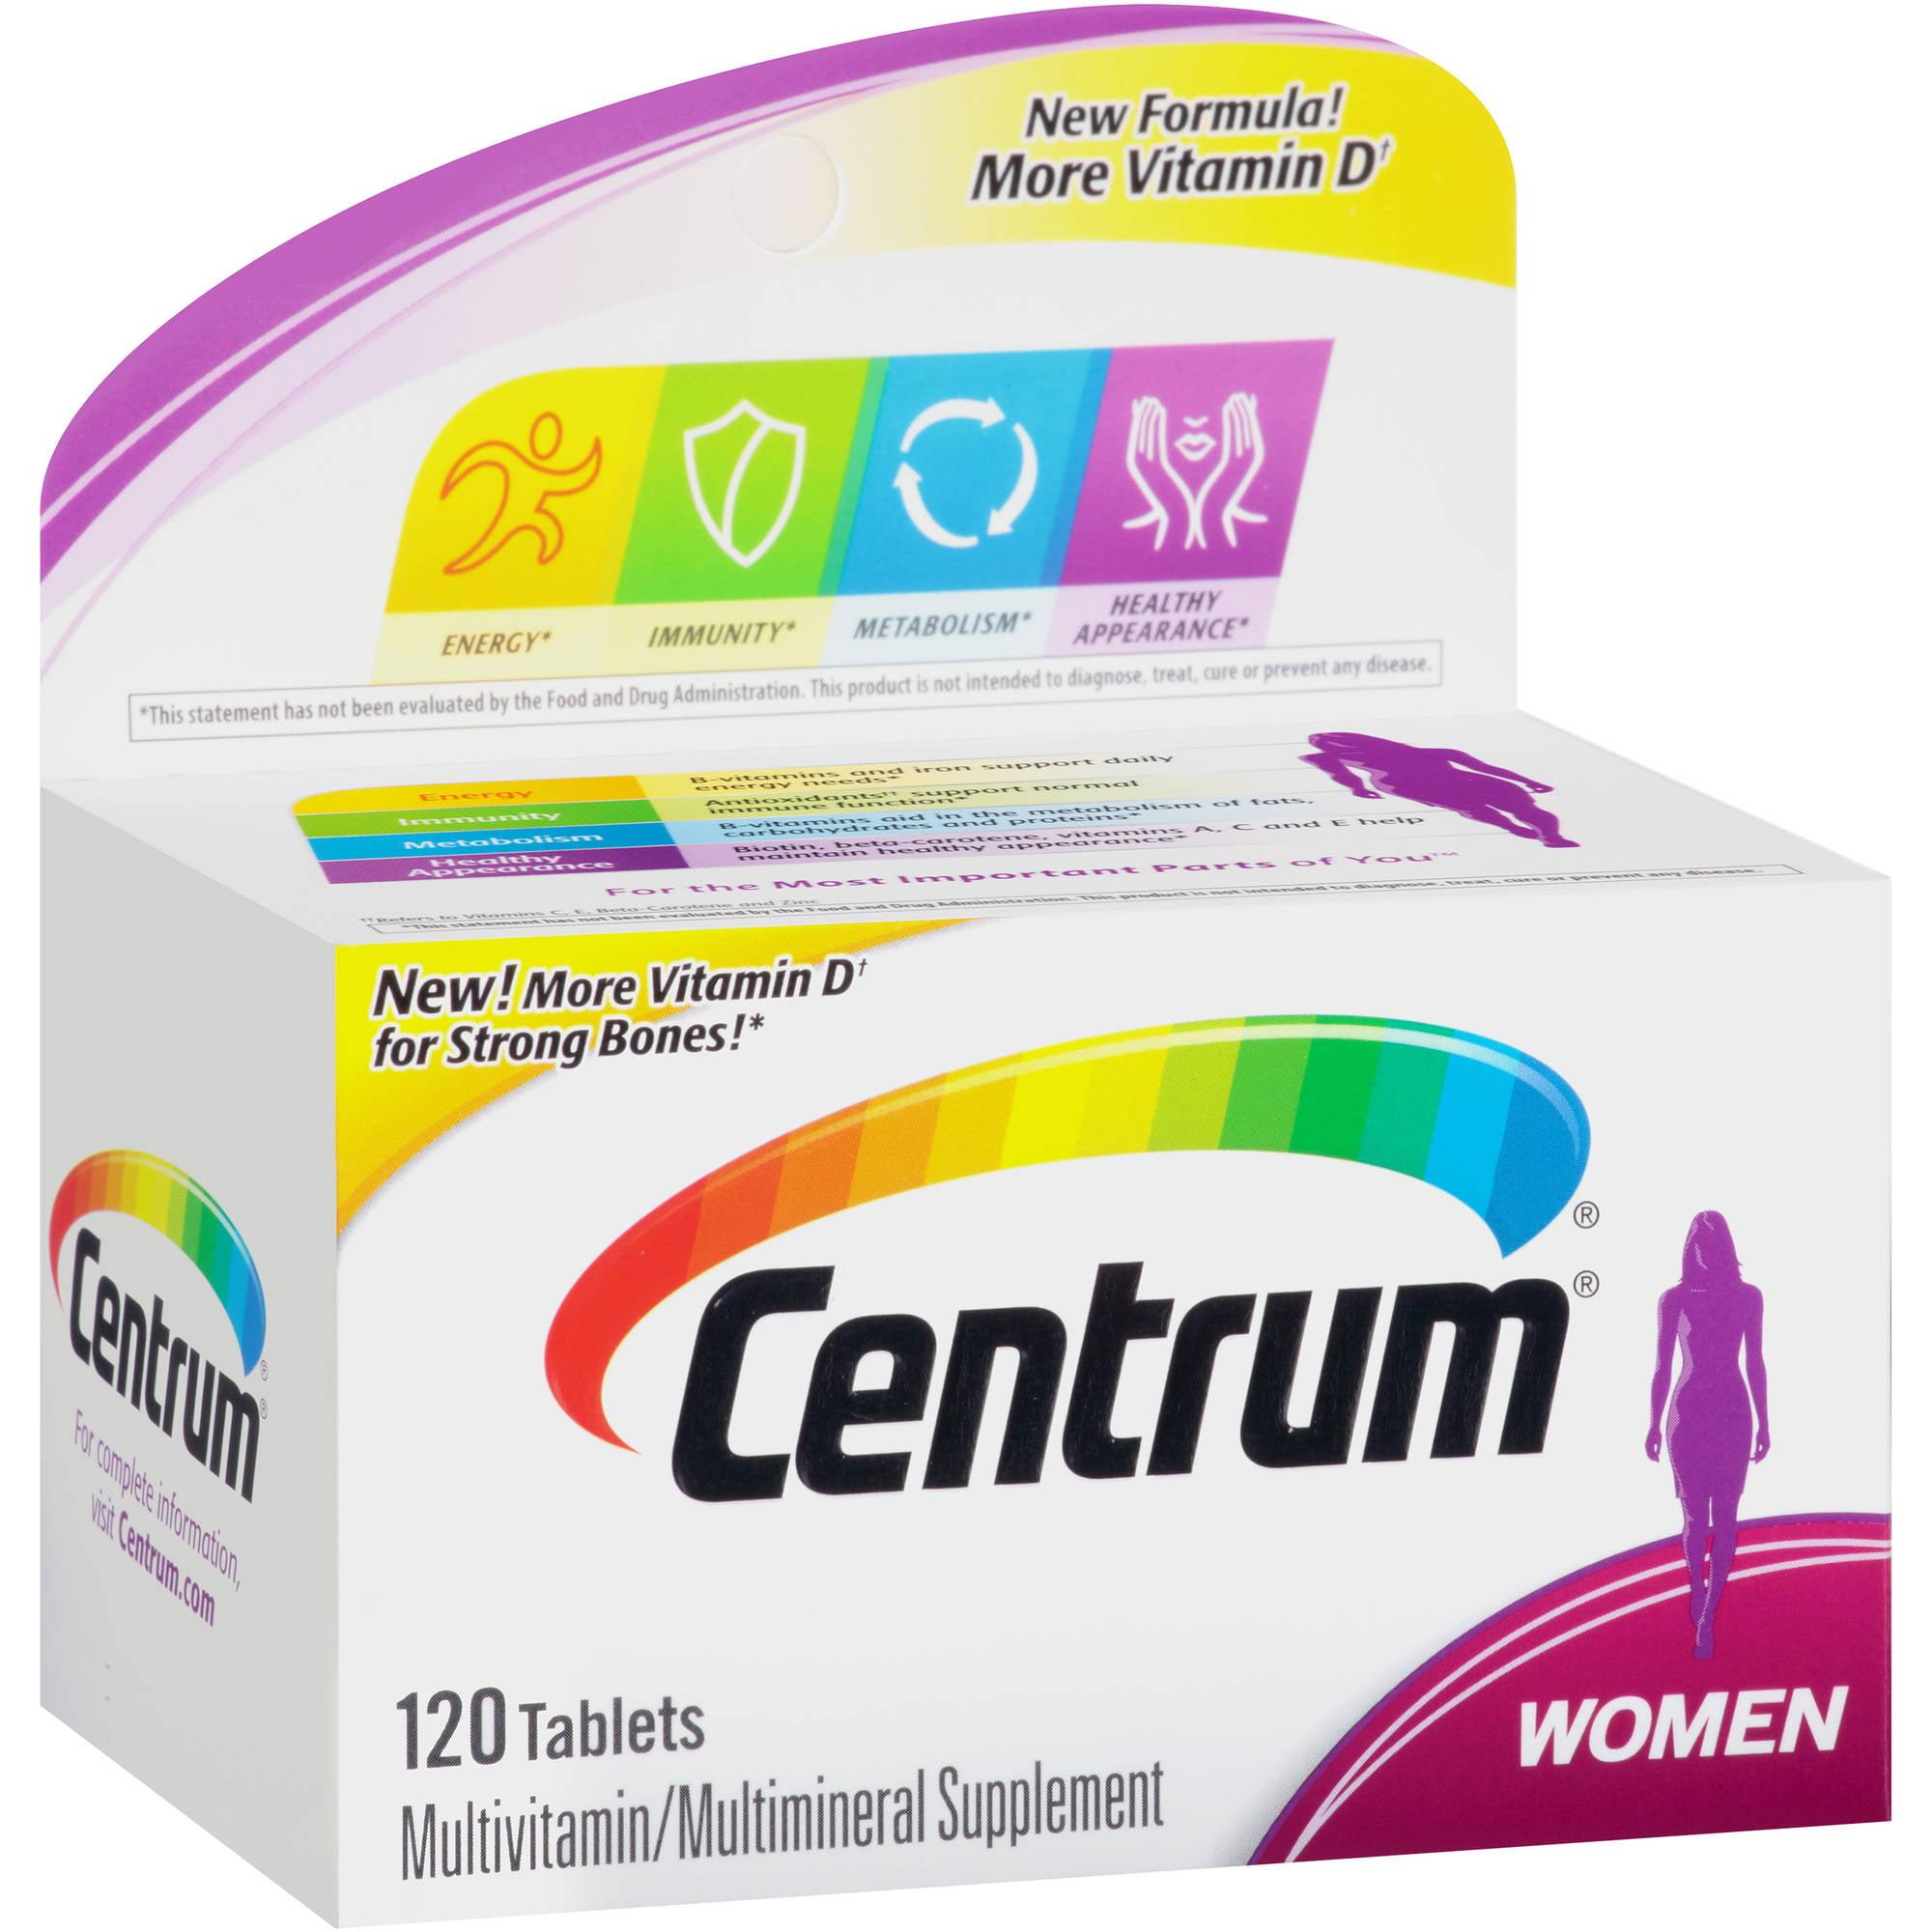 Centrum Women Multivitamin/Multimineral Supplement Tablets 120 Count